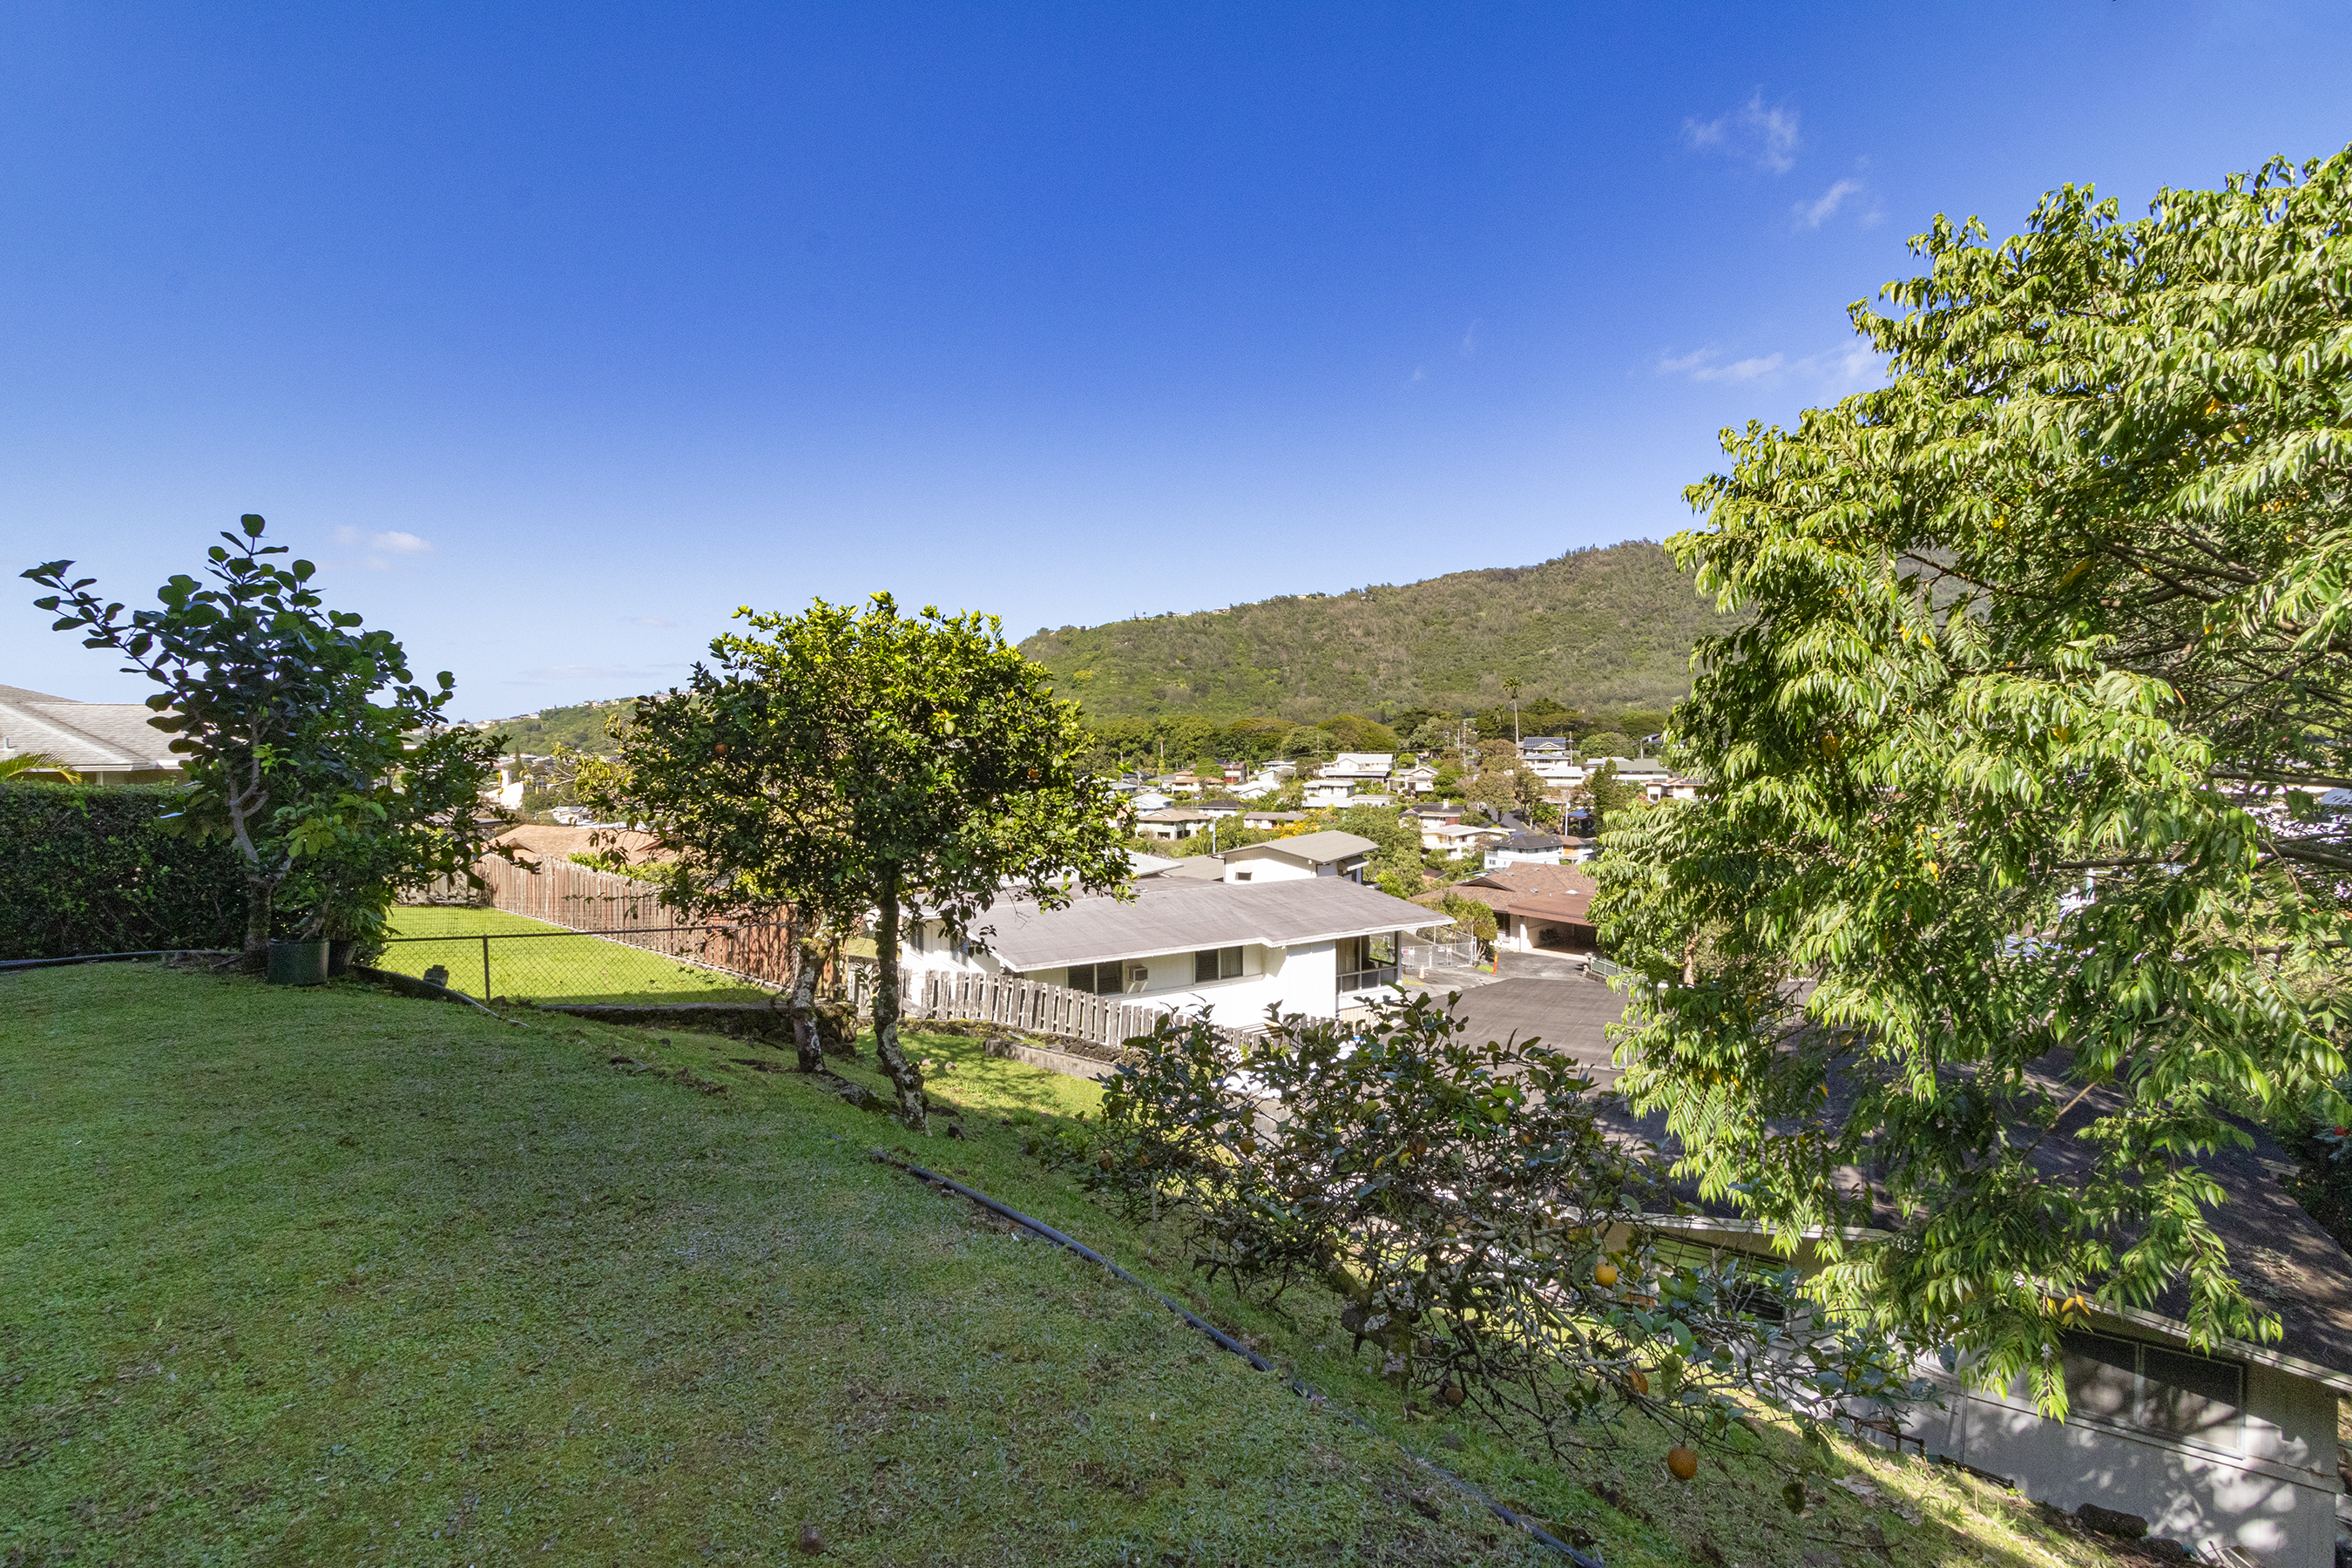 Backyard area at 380 Puiwa Road, Honolulu, HI 96817